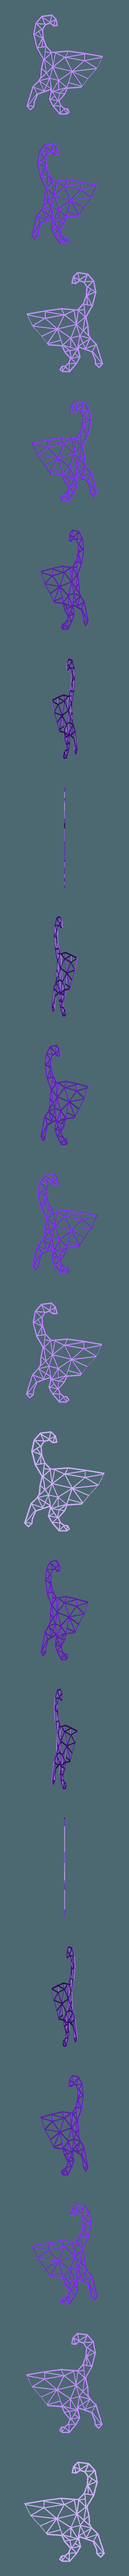 chat_un_a.stl Download free STL file WALL CAT DECORATION • 3D printable design, Luci